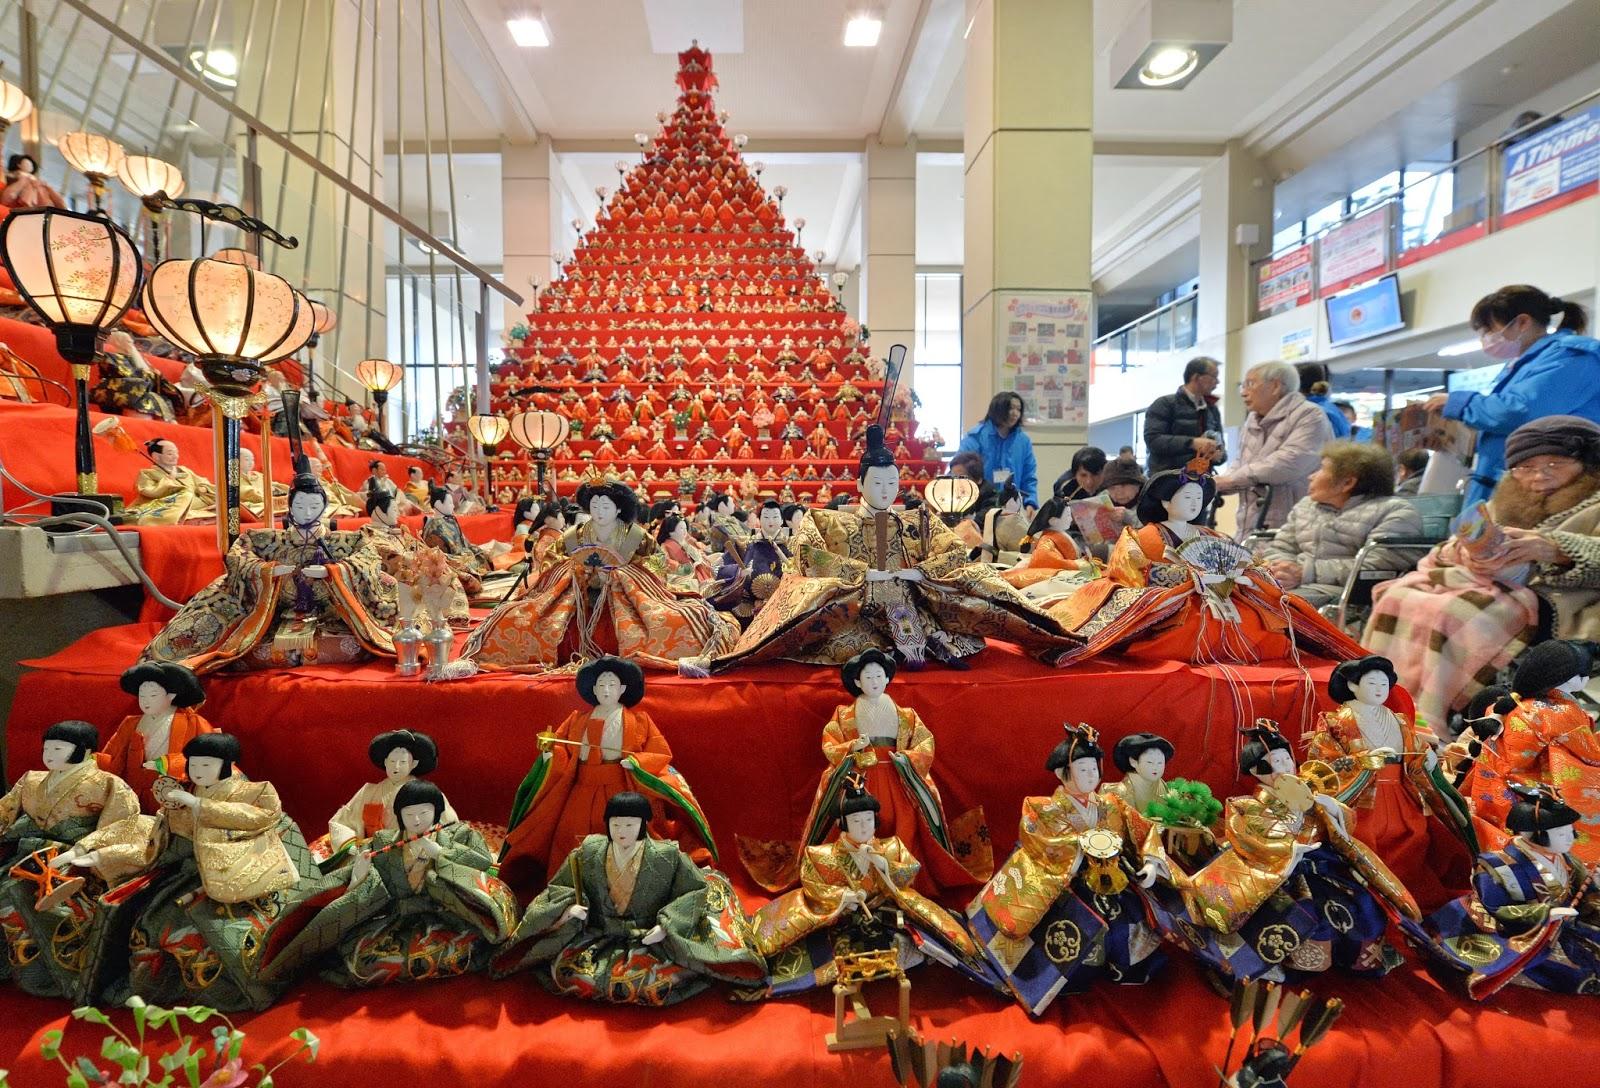 Culture, Doll Festival, Doll's Day, Festival, Girls' Day, Japan, Konosu Bikkuri Hinamatsuri, Konosu City Hall, New, Odairi-sama, Offbeat, Pyramid, Saitama, Dolls, Hina dolls,